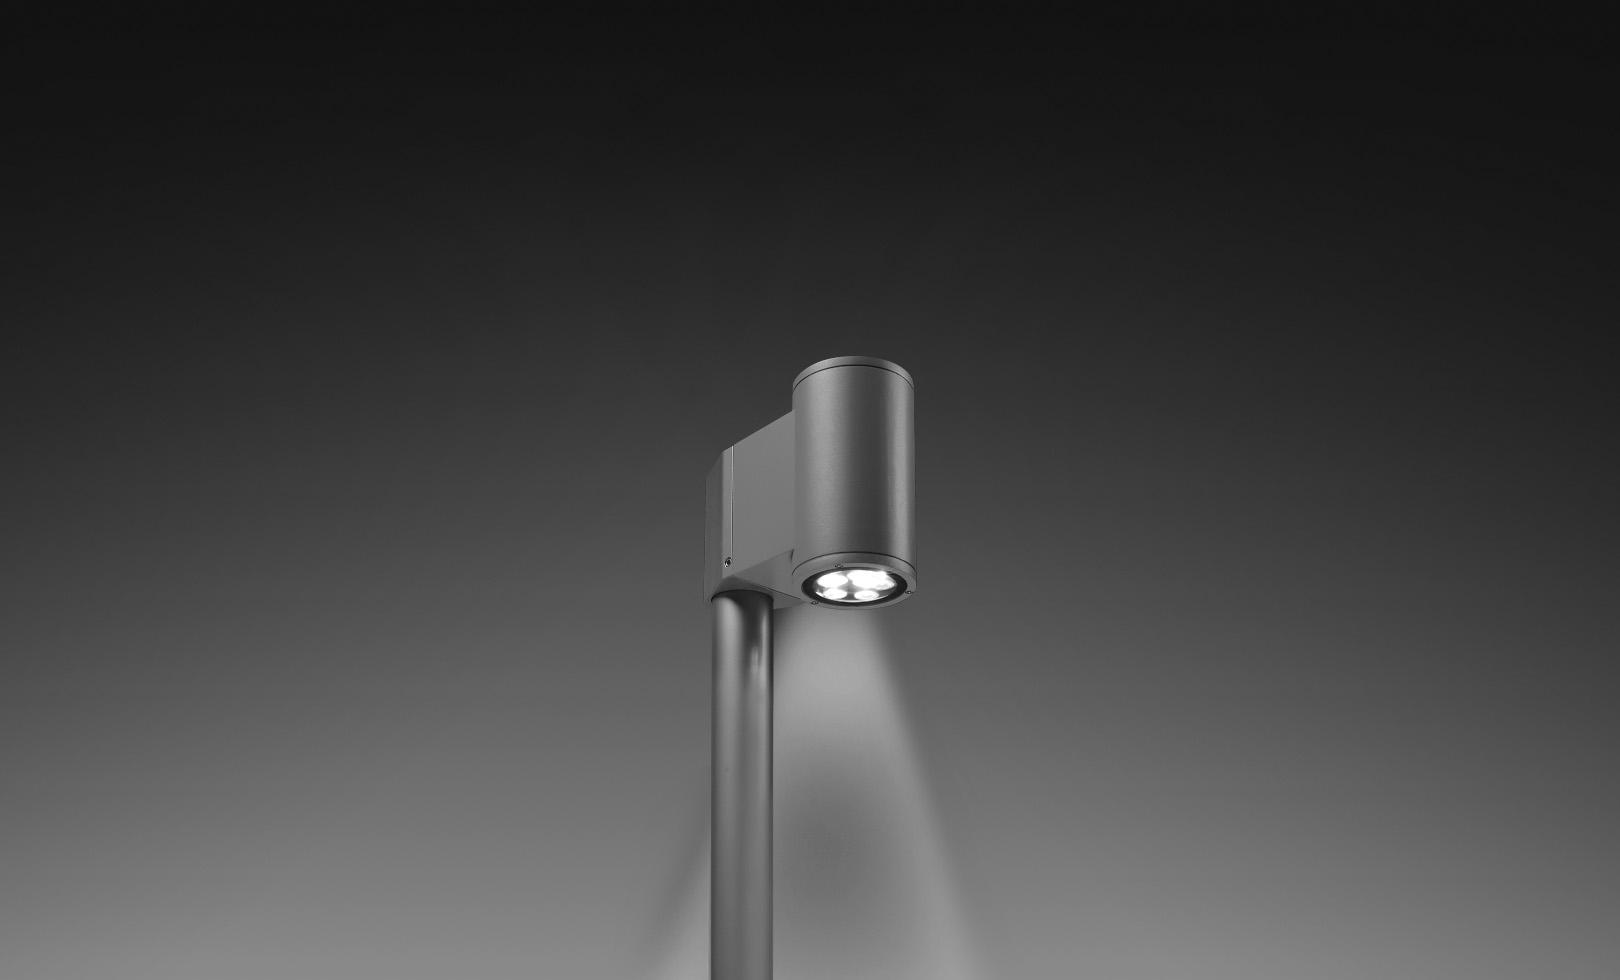 804001 SINGLE TECH POLE-TOP MEDIUM 01 ROUND LED 1x8W 1